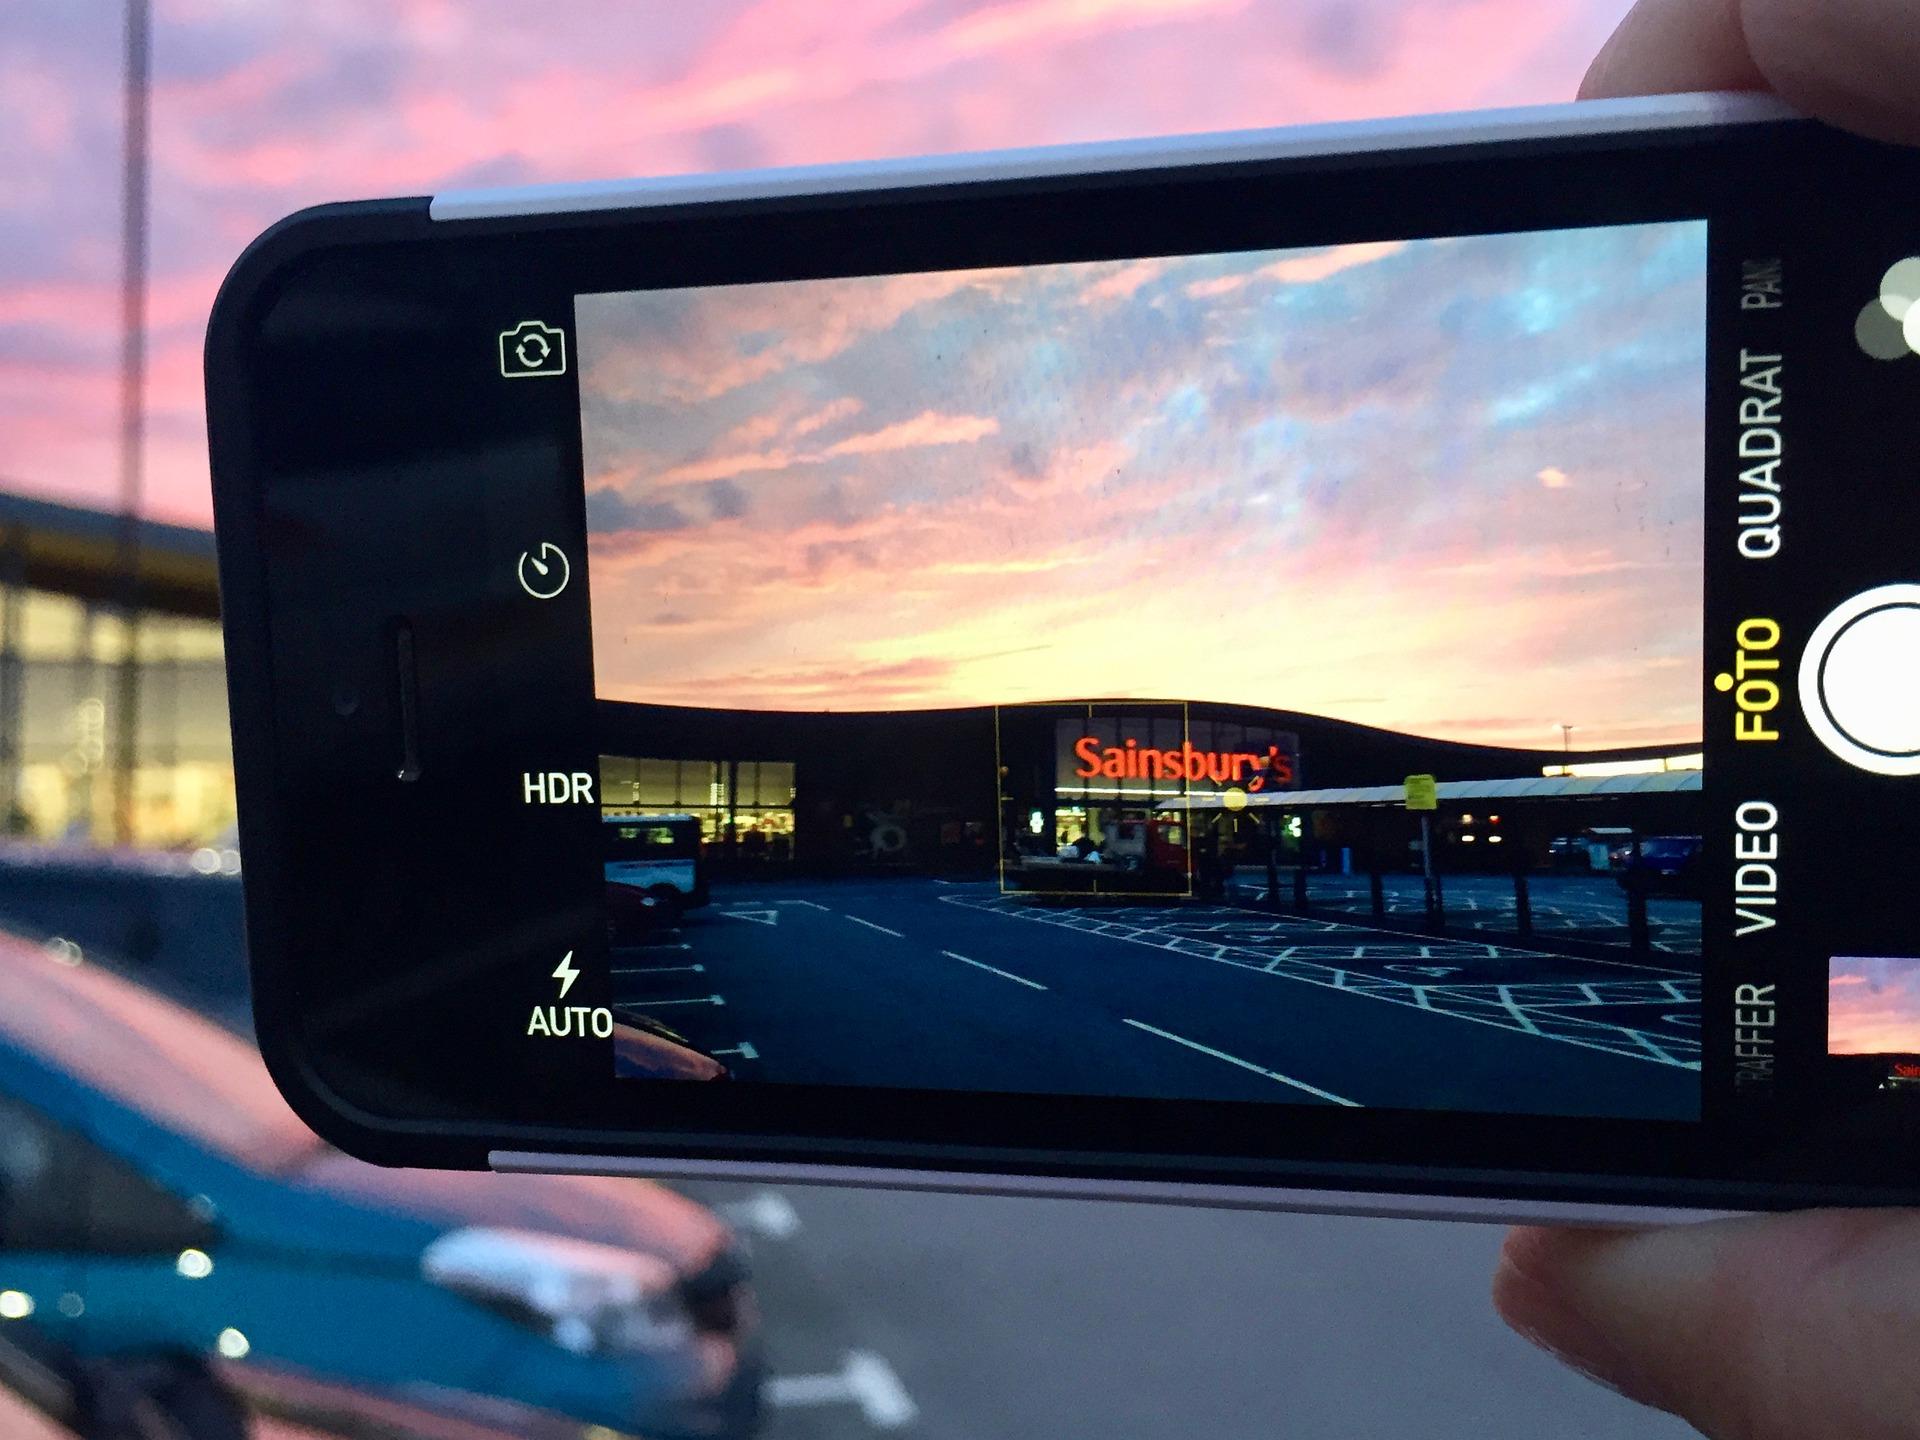 PicsArt-photo Studio for Android